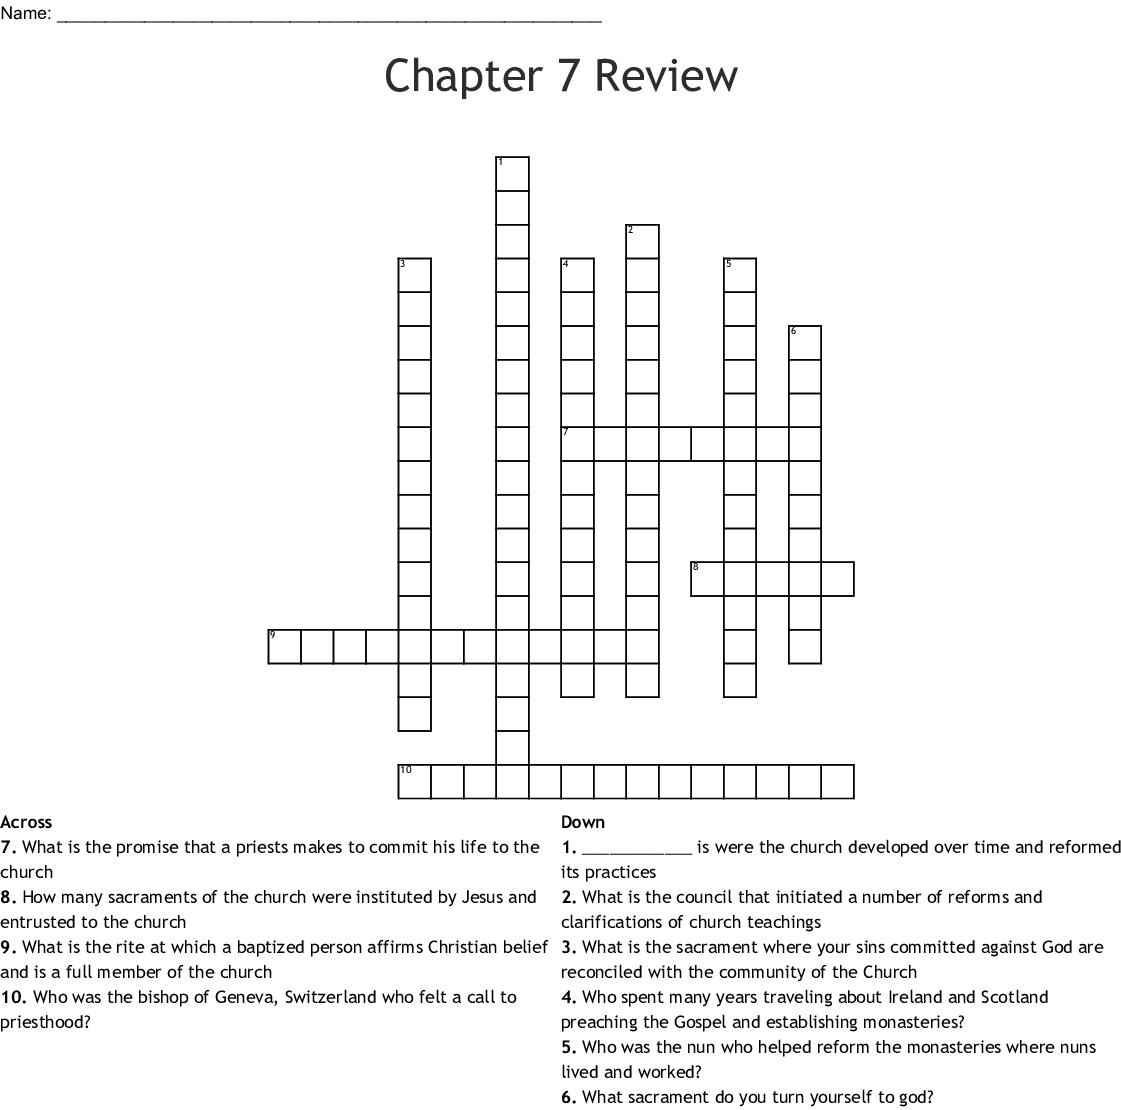 Saint Teresa of Avila Crossword - WordMint